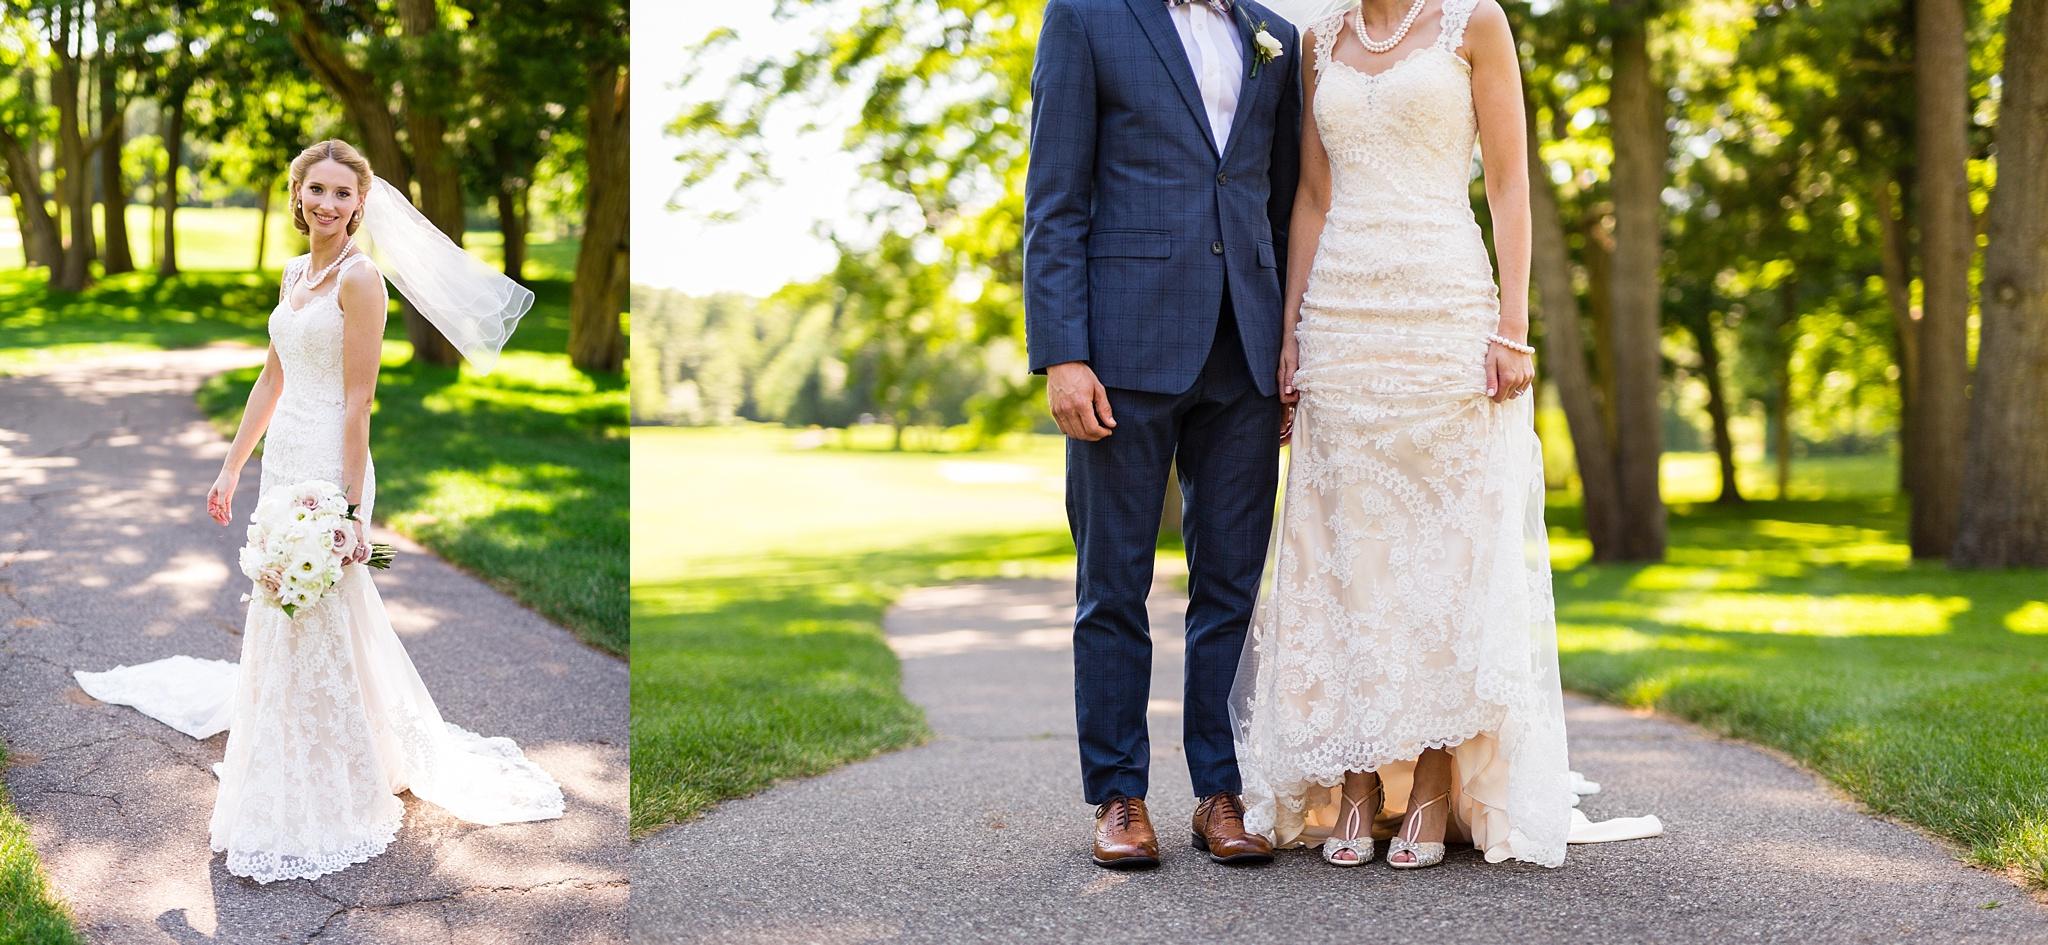 Becky_Cameron_Grand_Rapids_Blythefield Country_Club_Wedding032.JPG